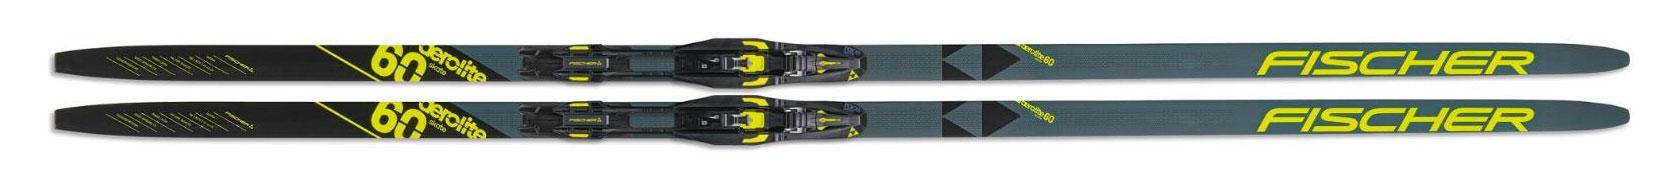 ischer Aerolite 60 Skate Skis with TURNAMIC Bindings